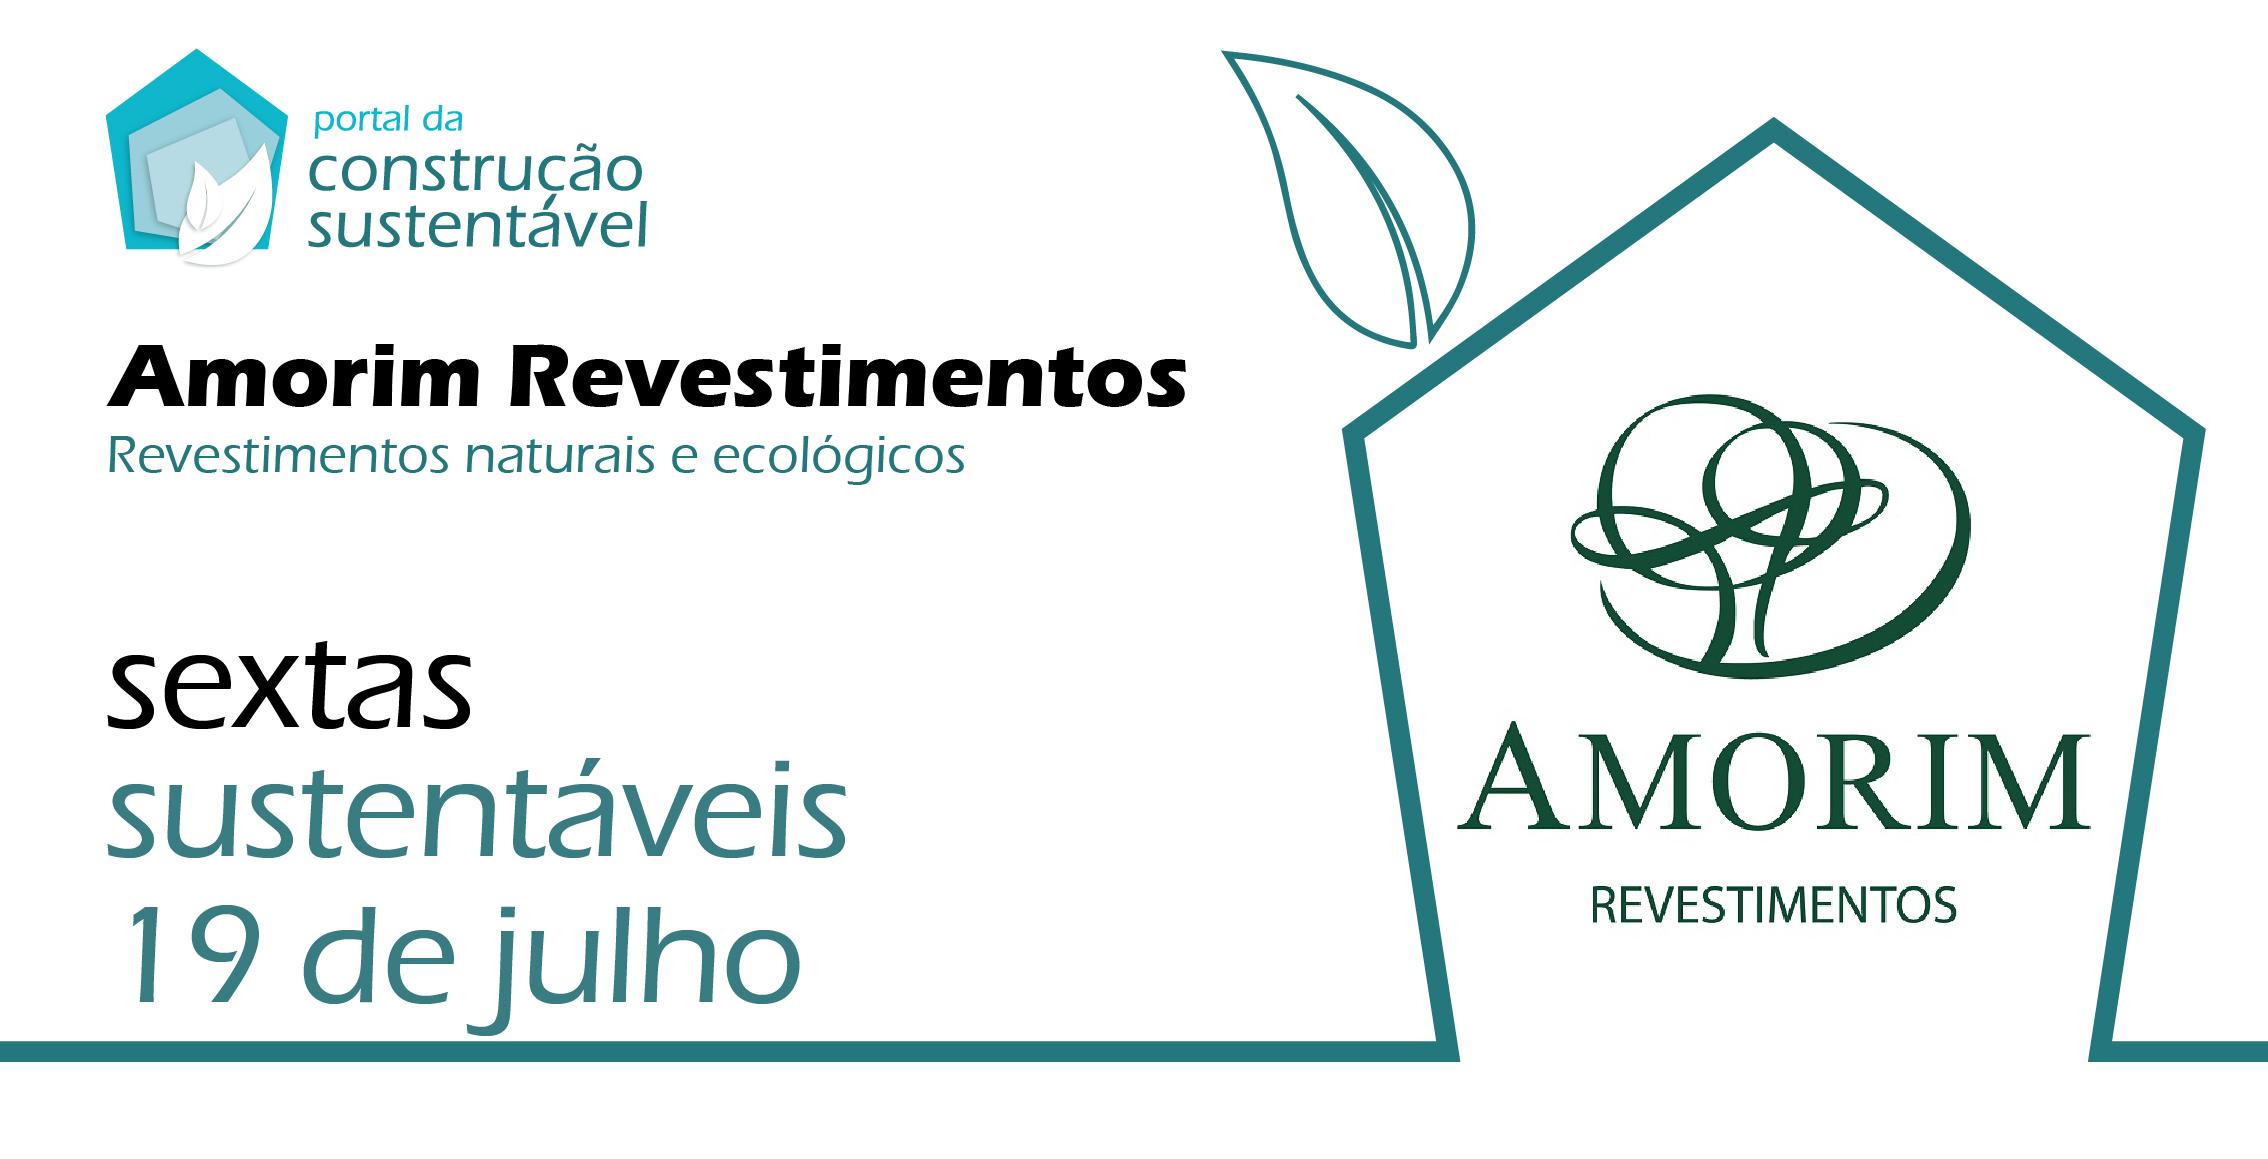 SEXTA SUSTENTÁVEL | AMORIM REVESTIMENTOS